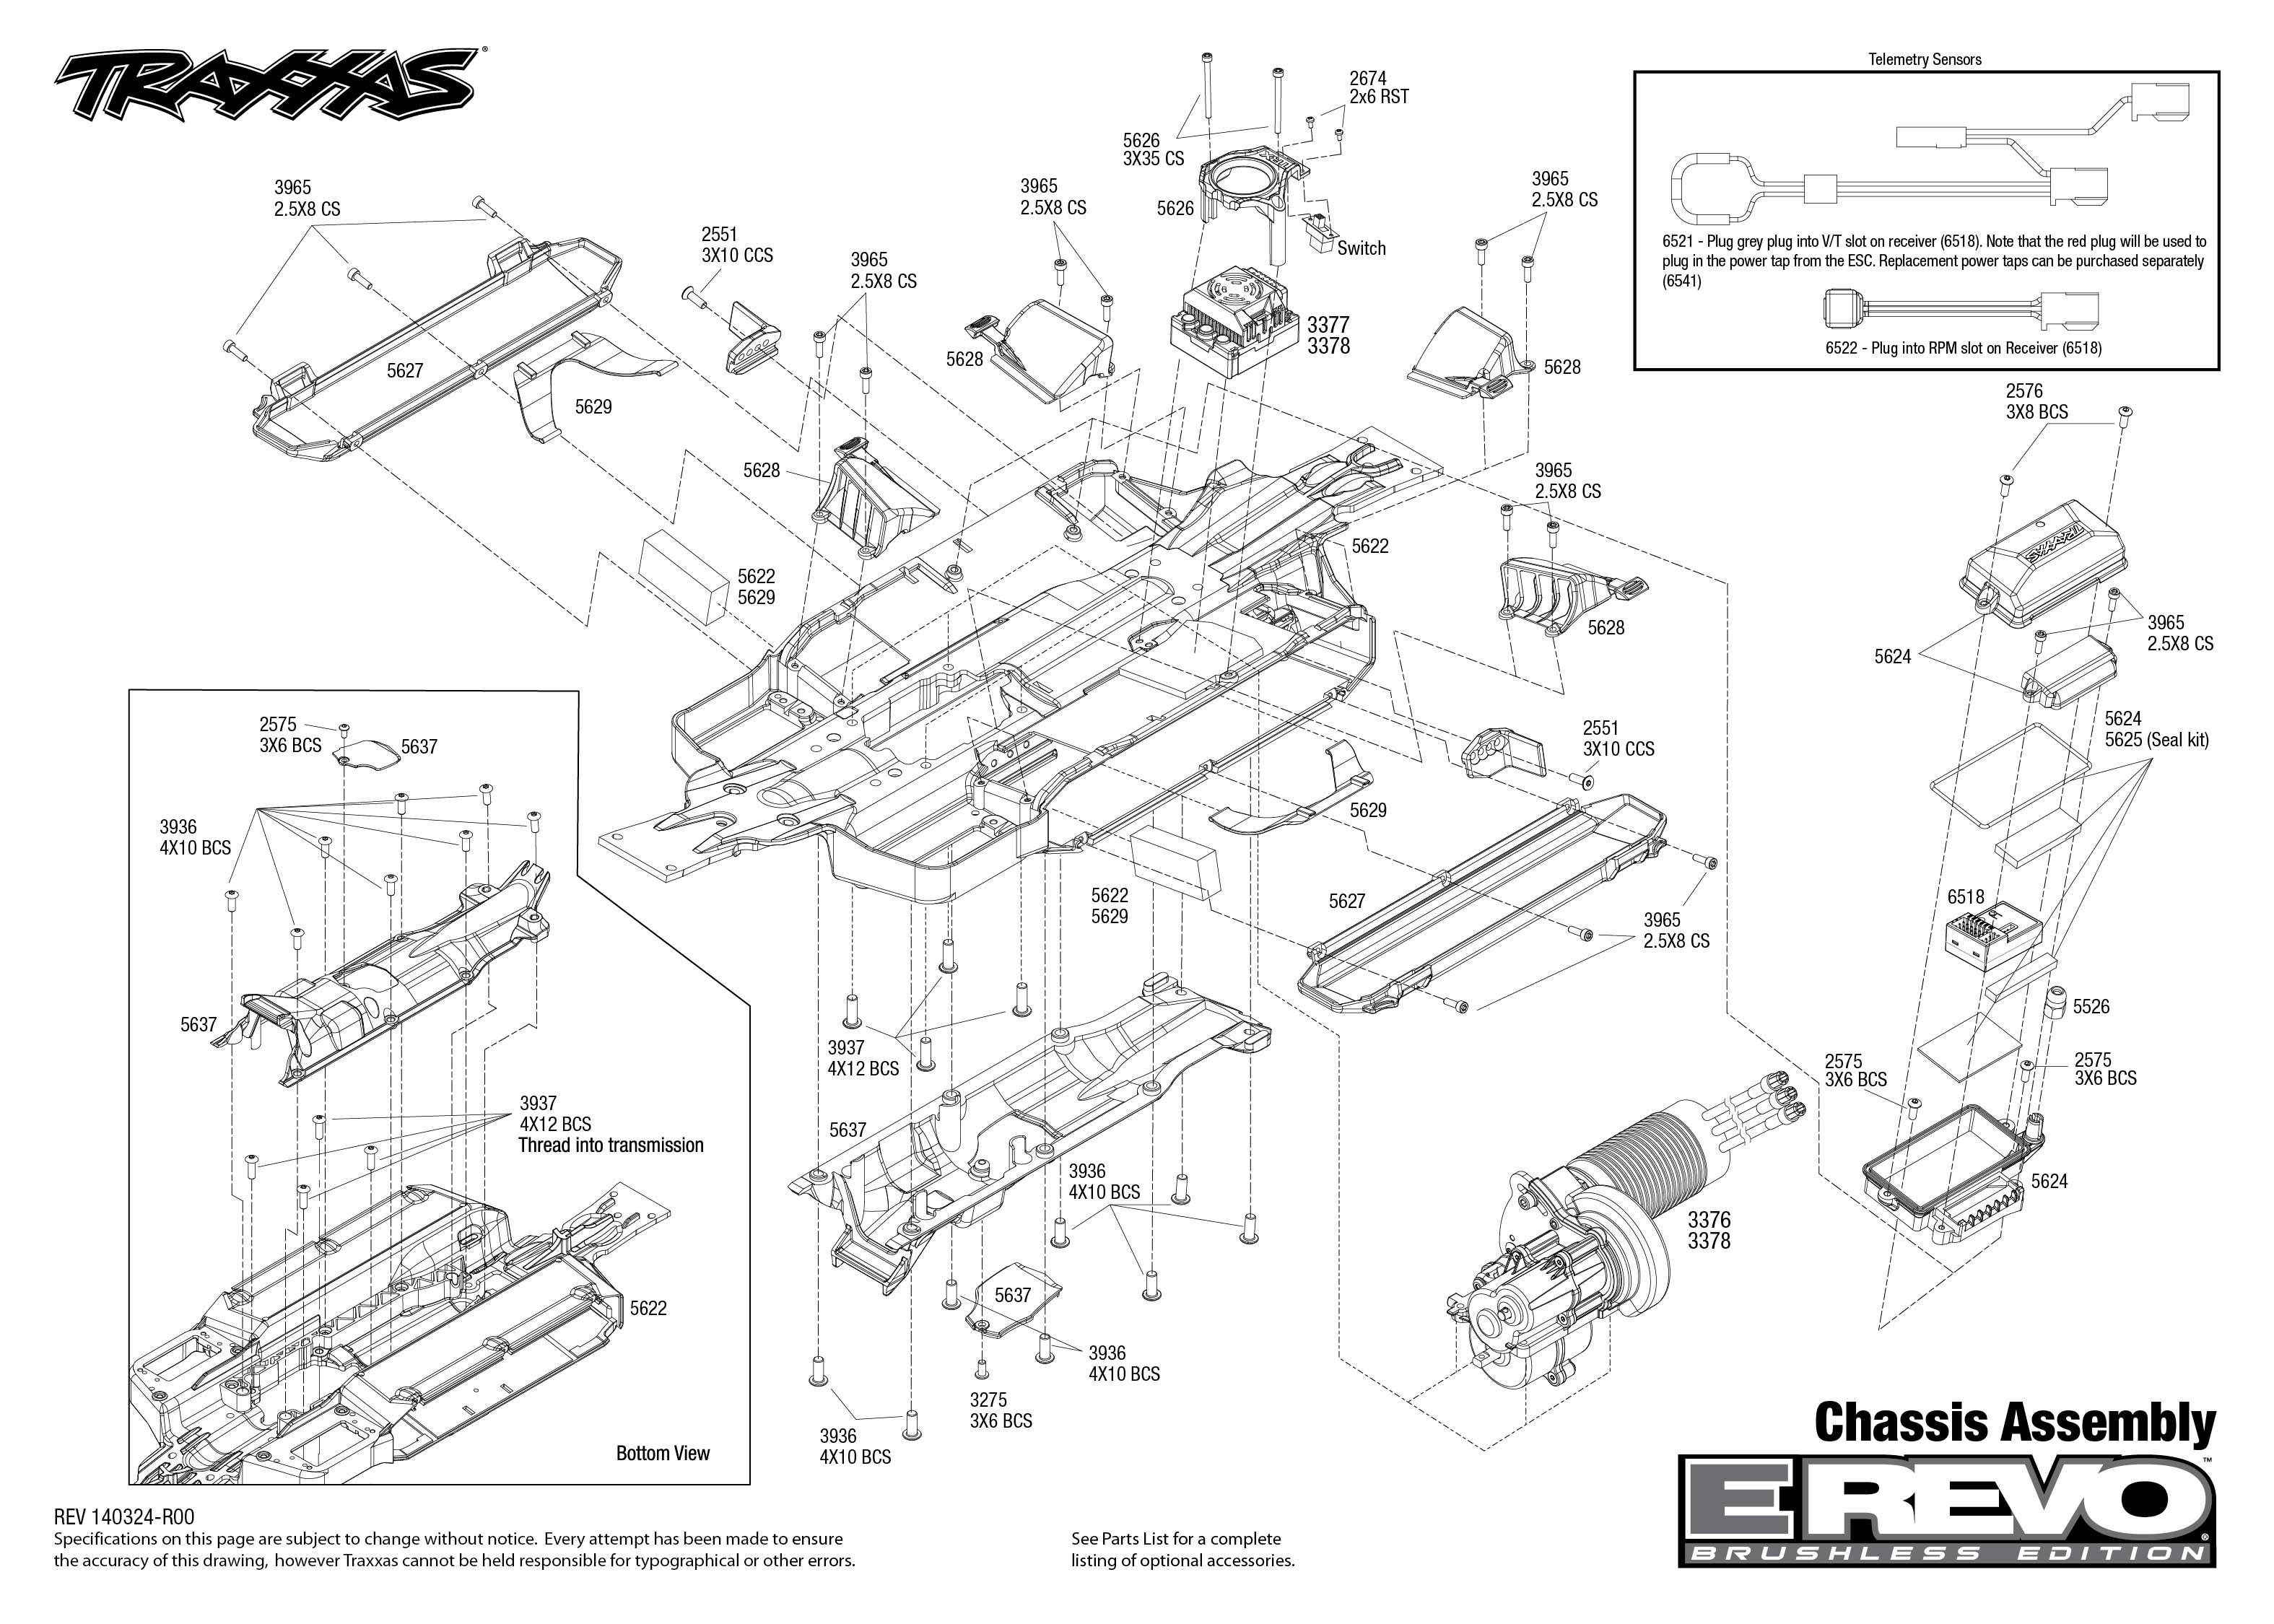 Traxxas Wiring Diagrams Layout Race Car Harness Diagram Revo 2 5 Detailed Schematics Rh Keyplusrubber Com Ez Battery